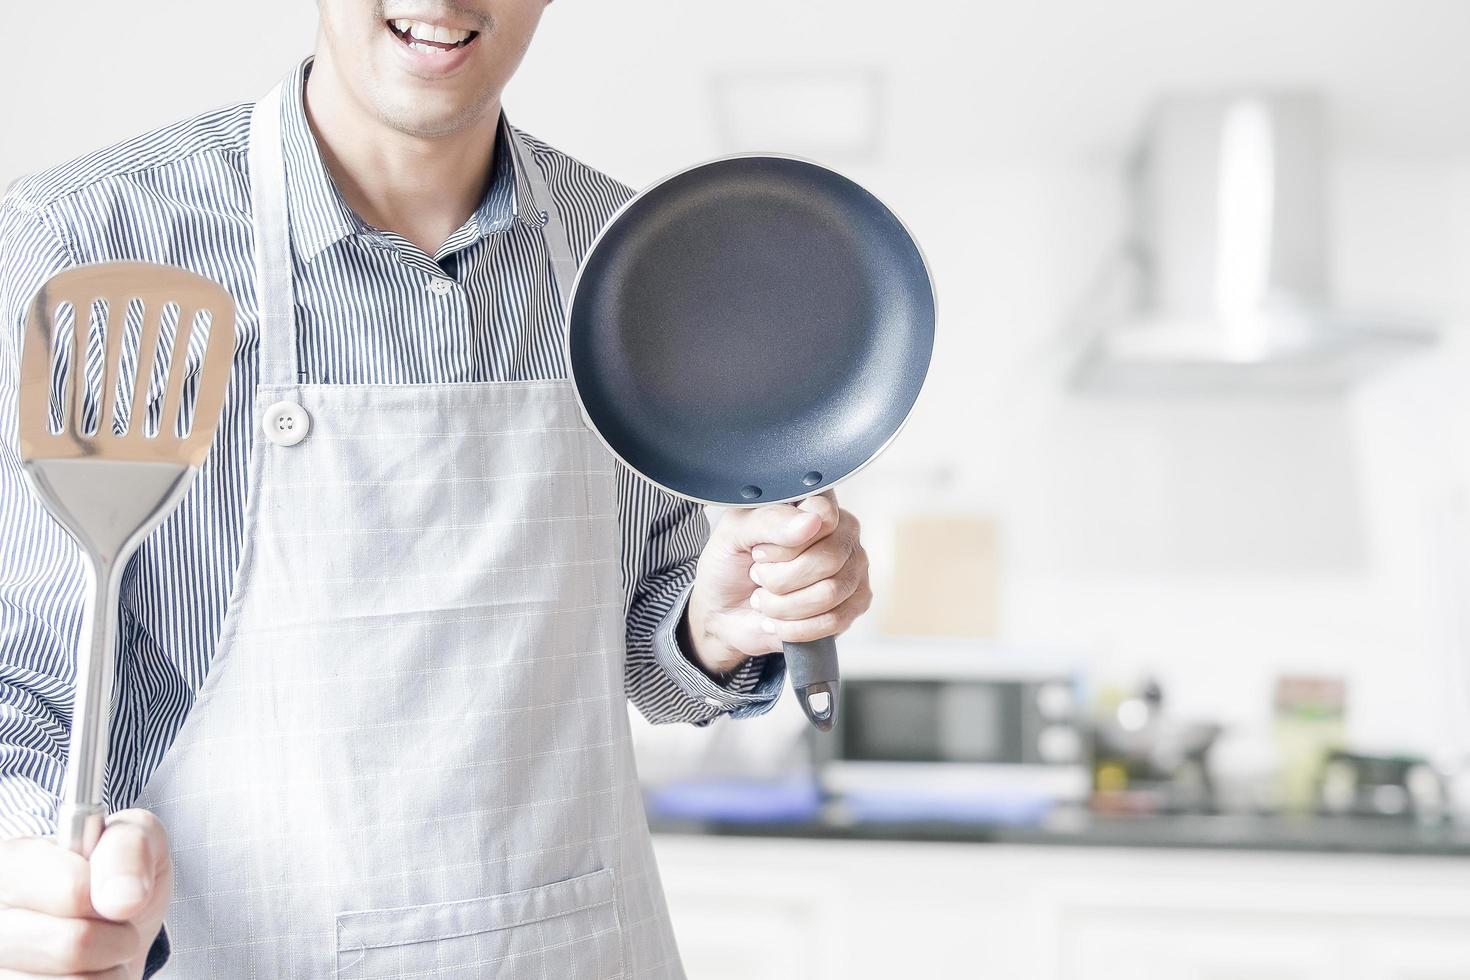 Man holding a pan and spatula photo